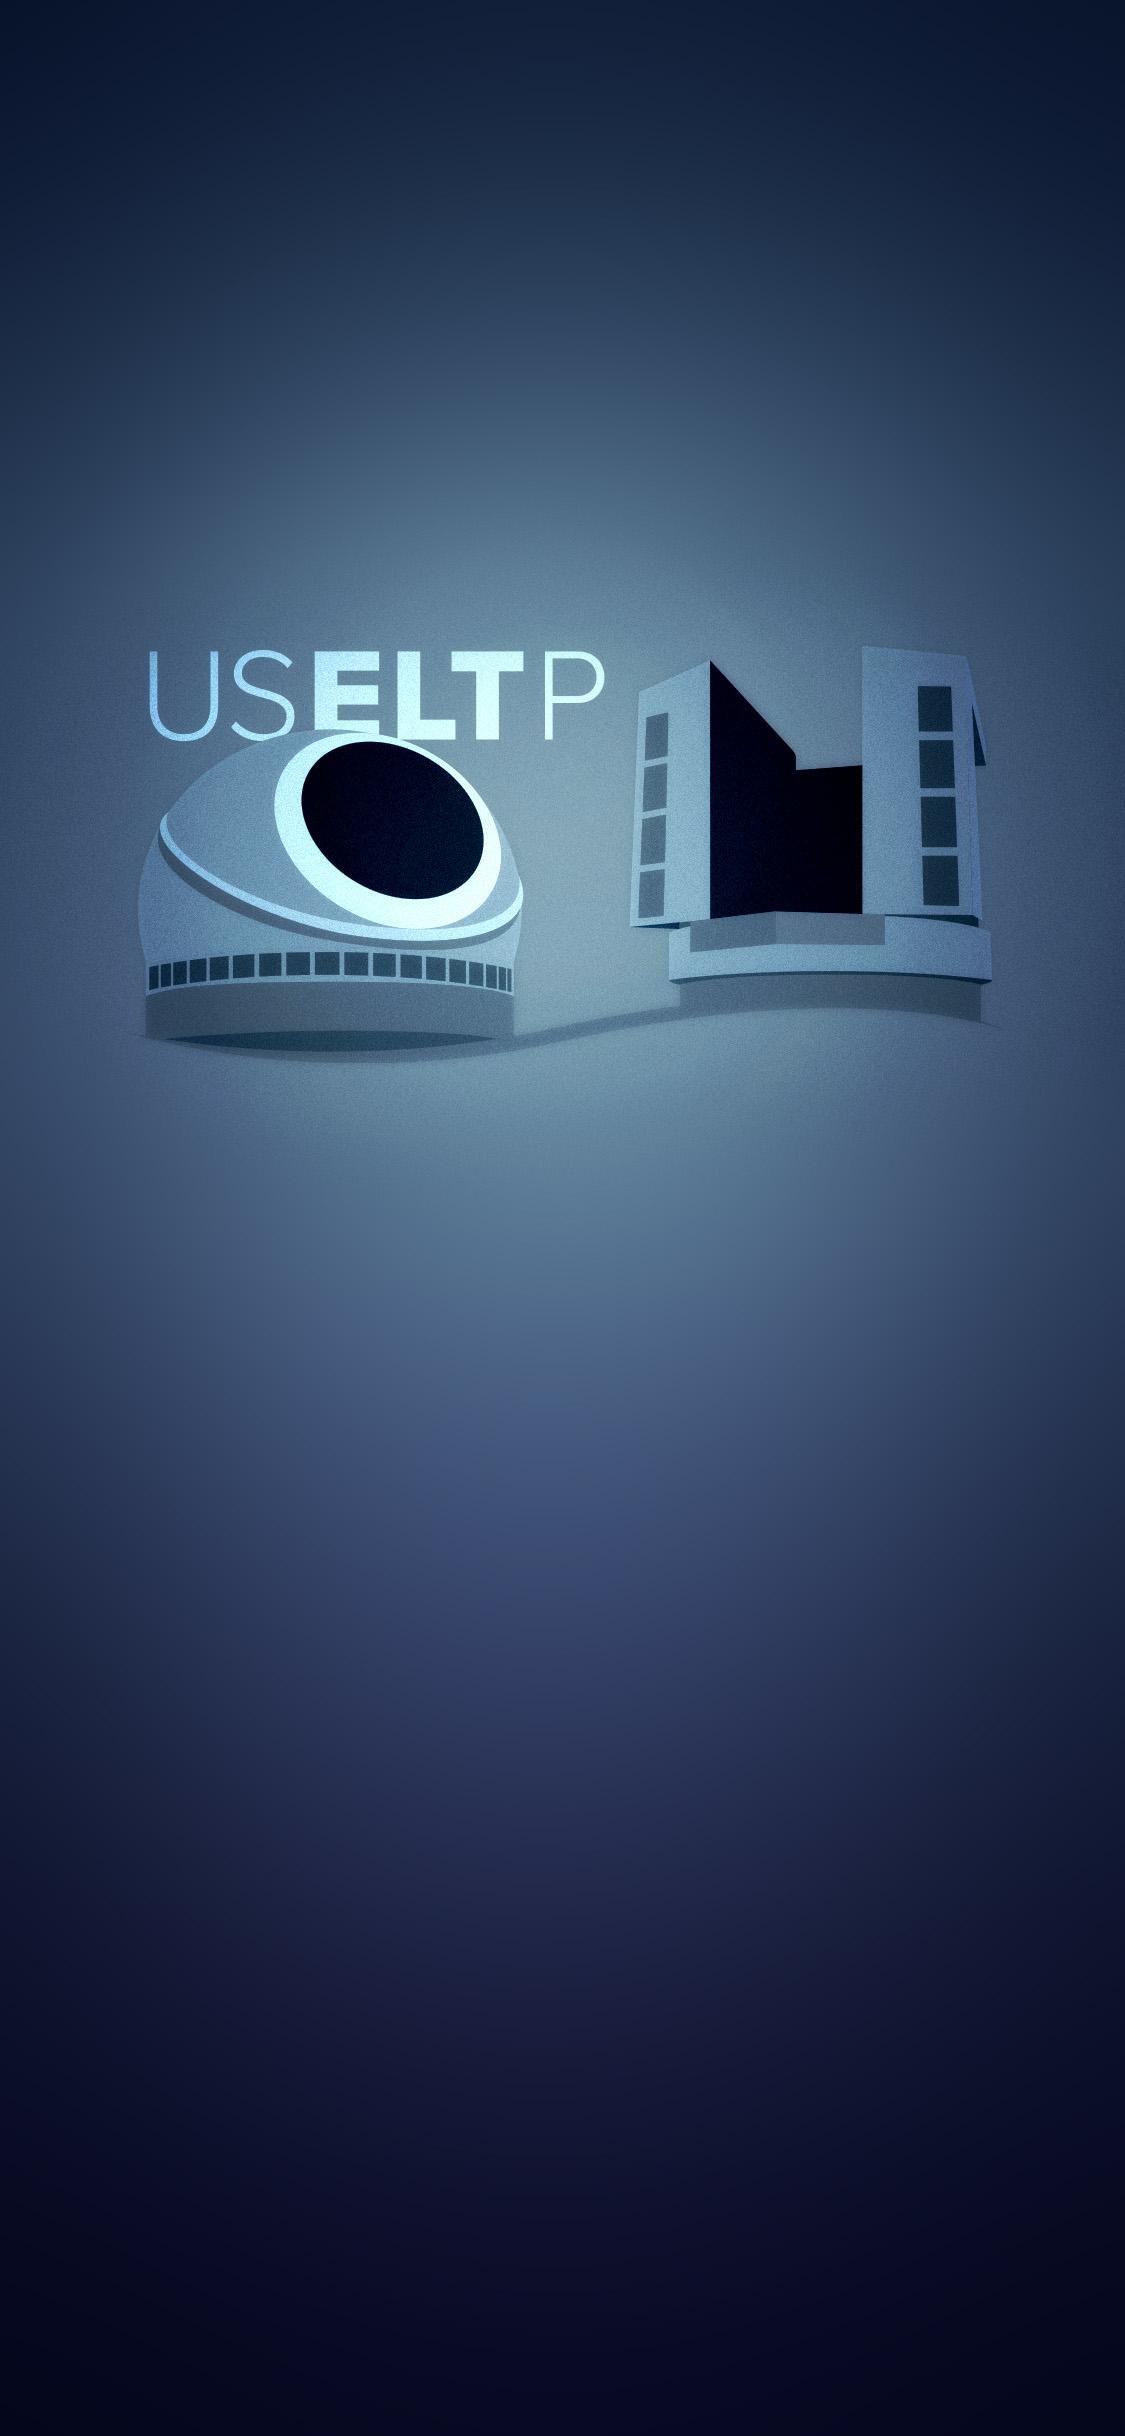 Phone Screen blue